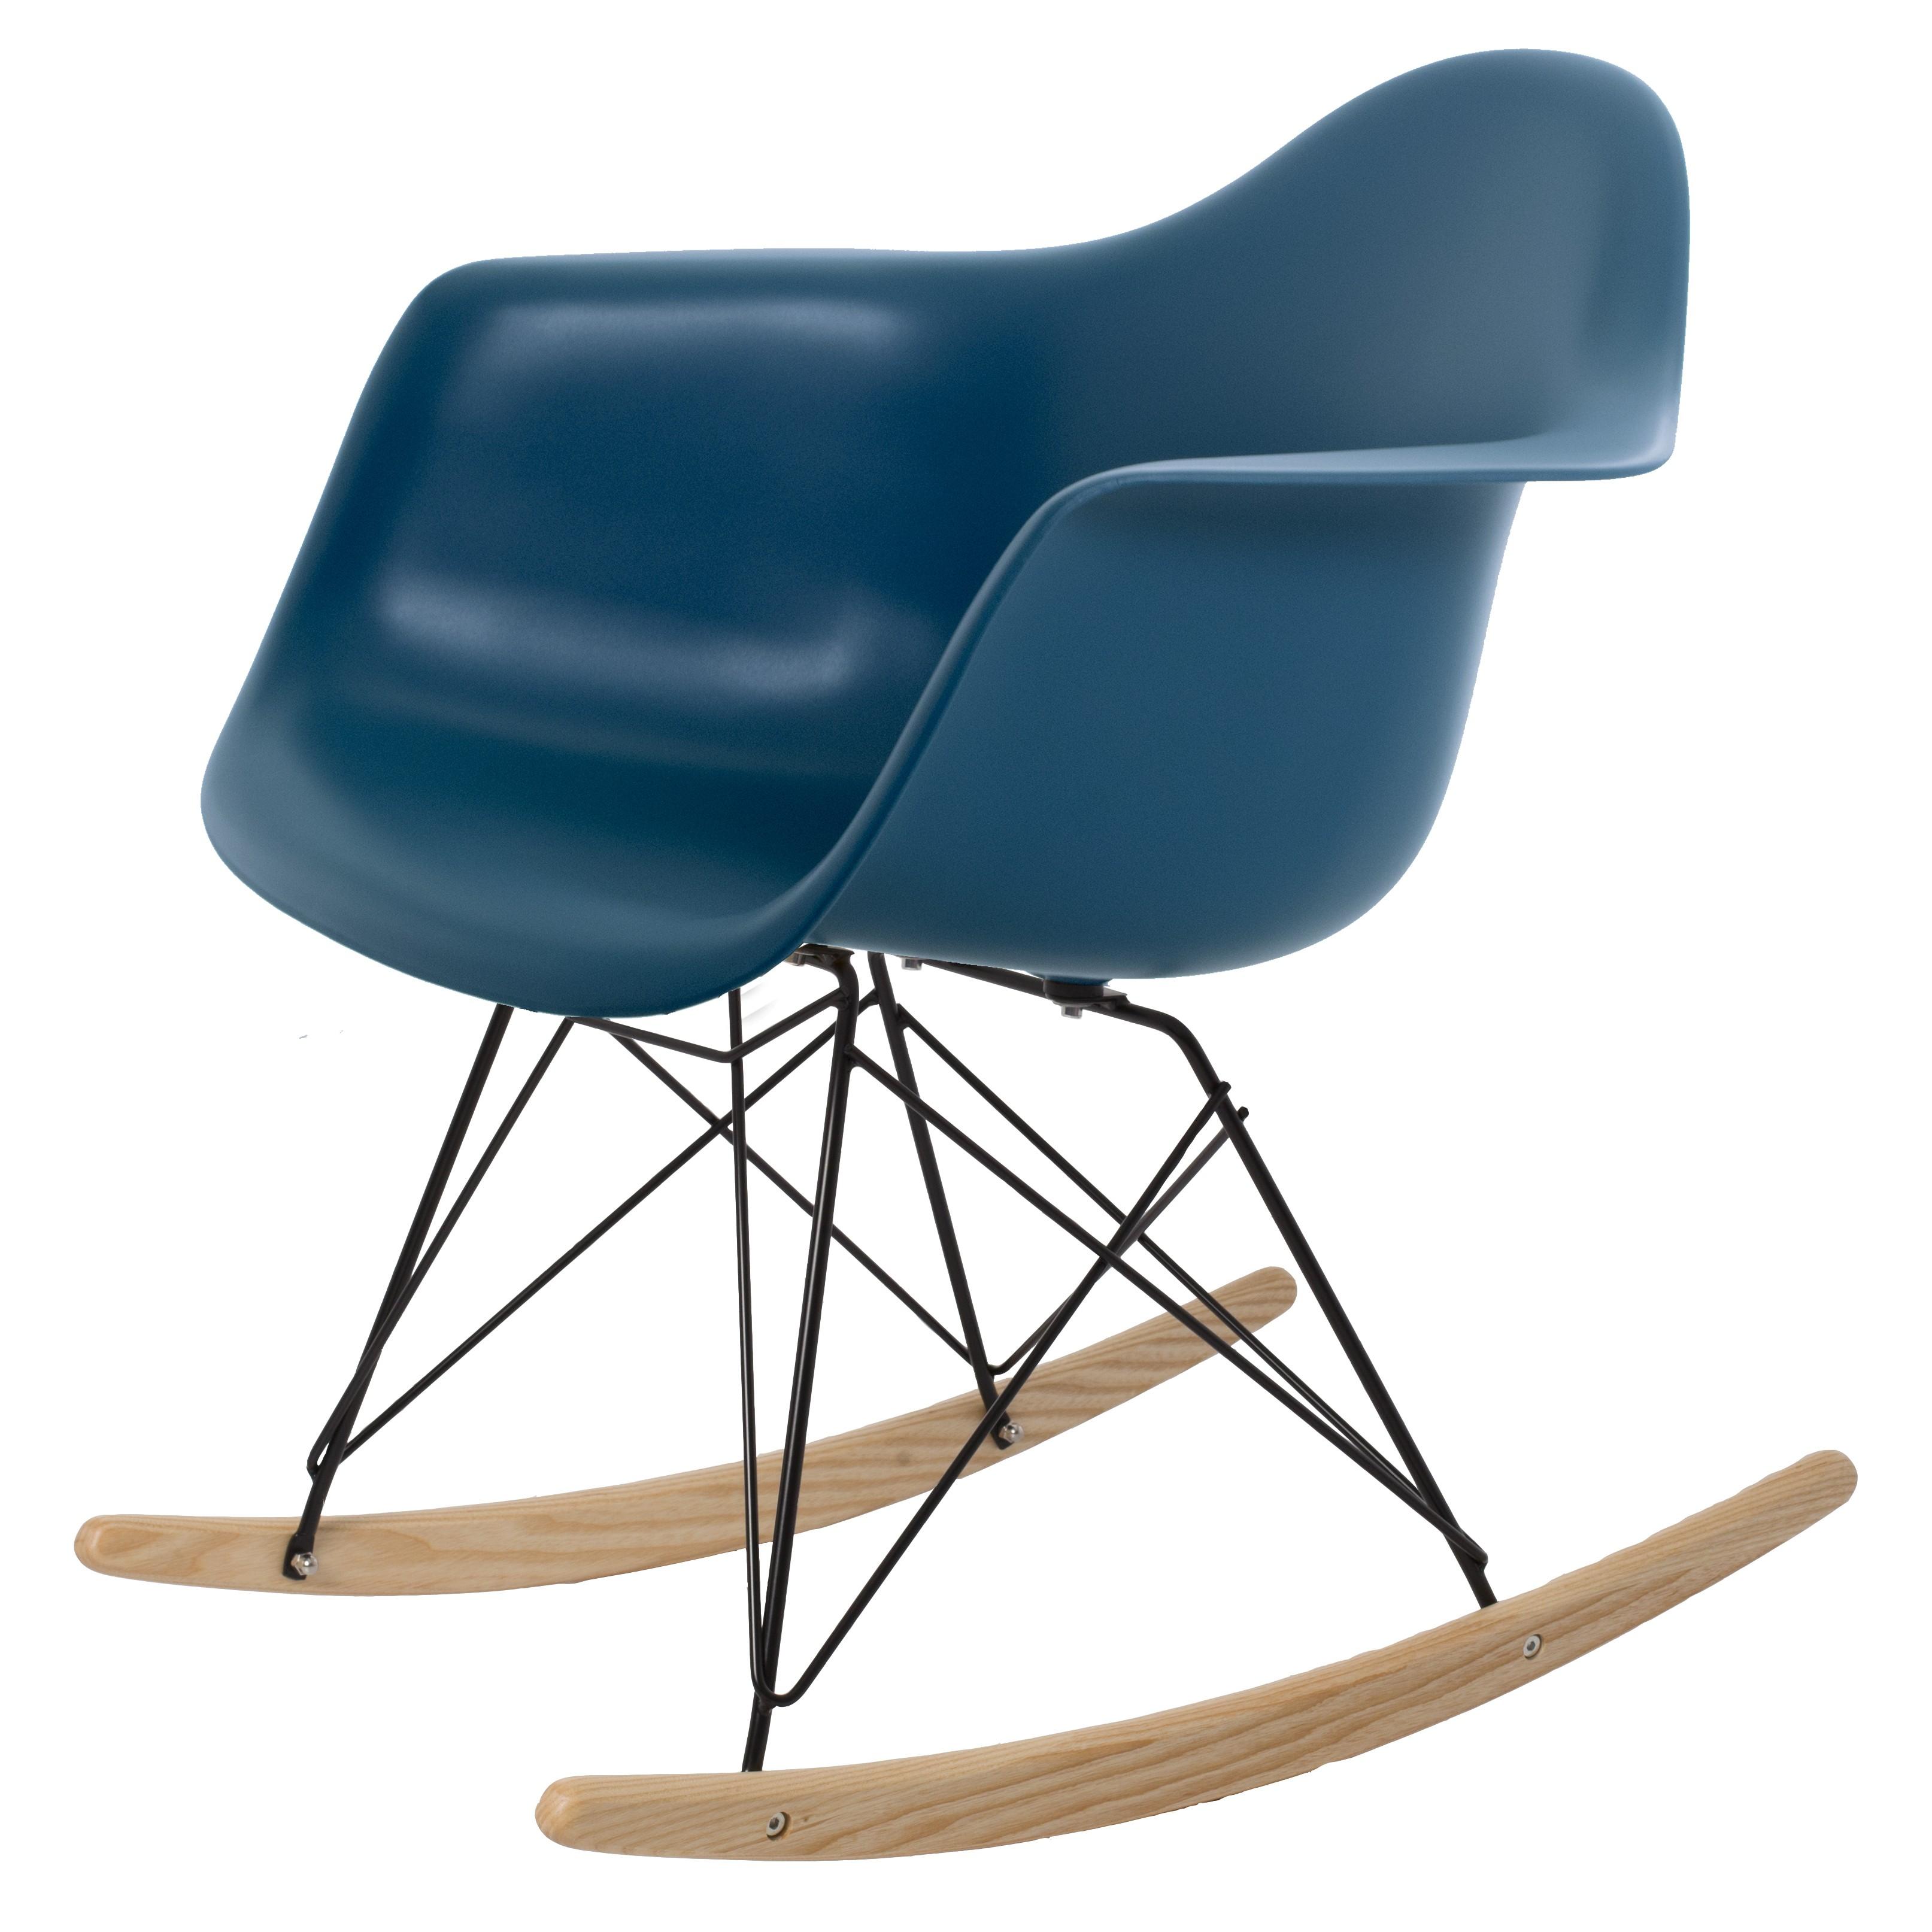 charles eames schommelstoel rar zwart frame schommelstoel design schommelstoel. Black Bedroom Furniture Sets. Home Design Ideas